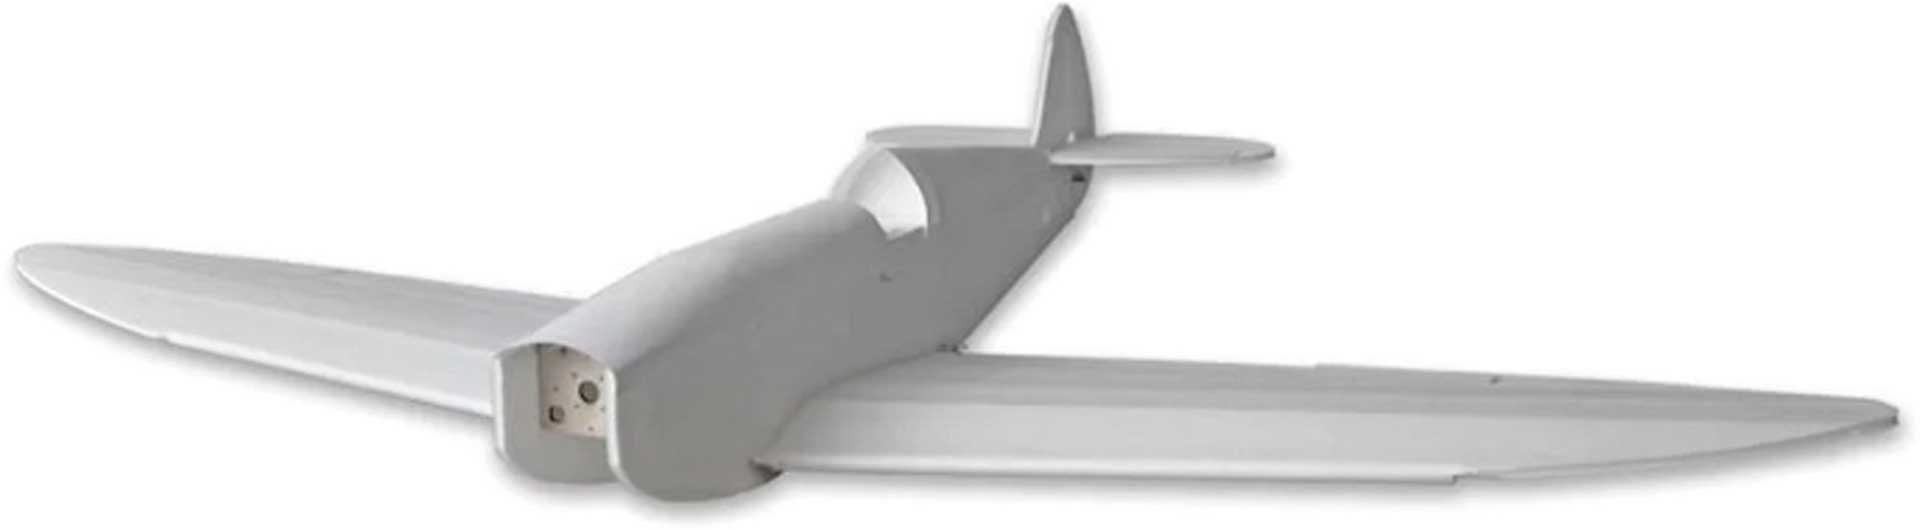 FLITE TEST Spitfire Speed Build Kit Maker Foam